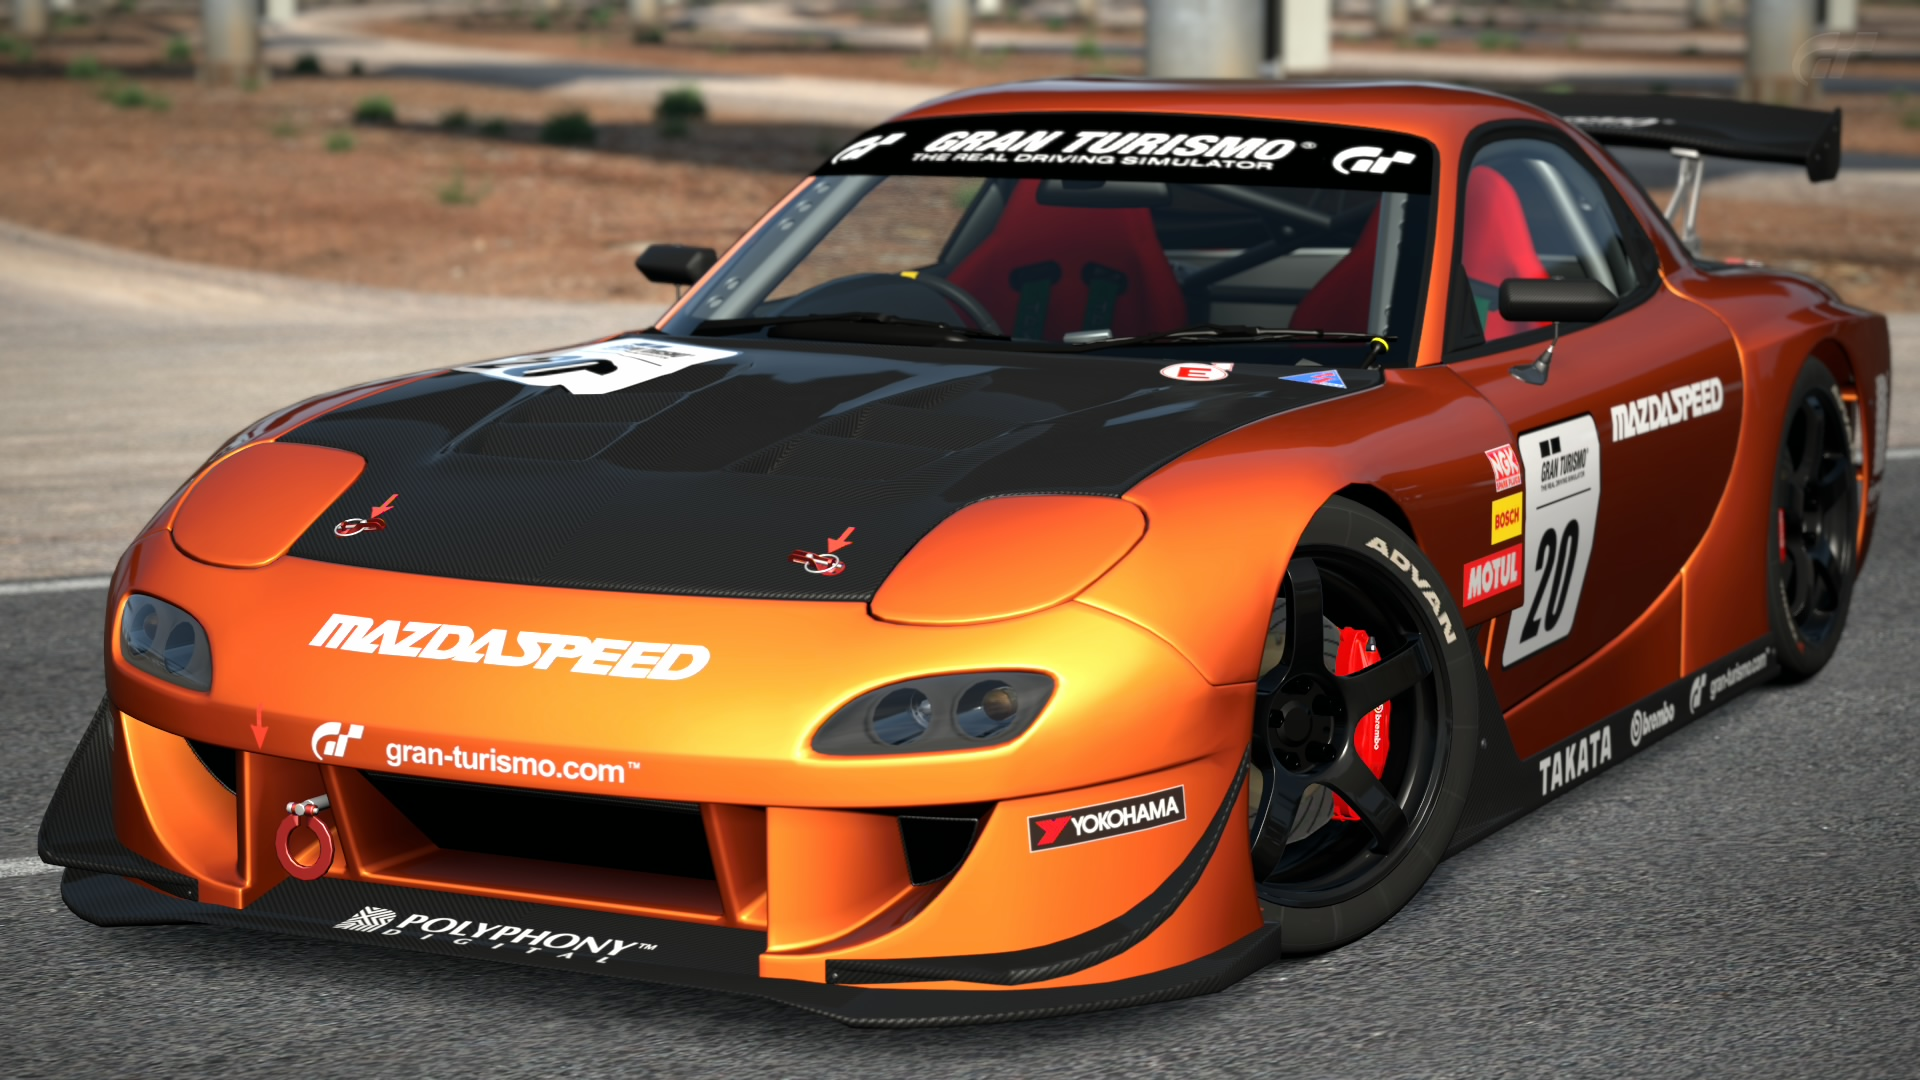 Mazda Rx7 Latest Model >> Image - Mazda RX-7 Touring Car.jpg | Gran Turismo Wiki | FANDOM powered by Wikia